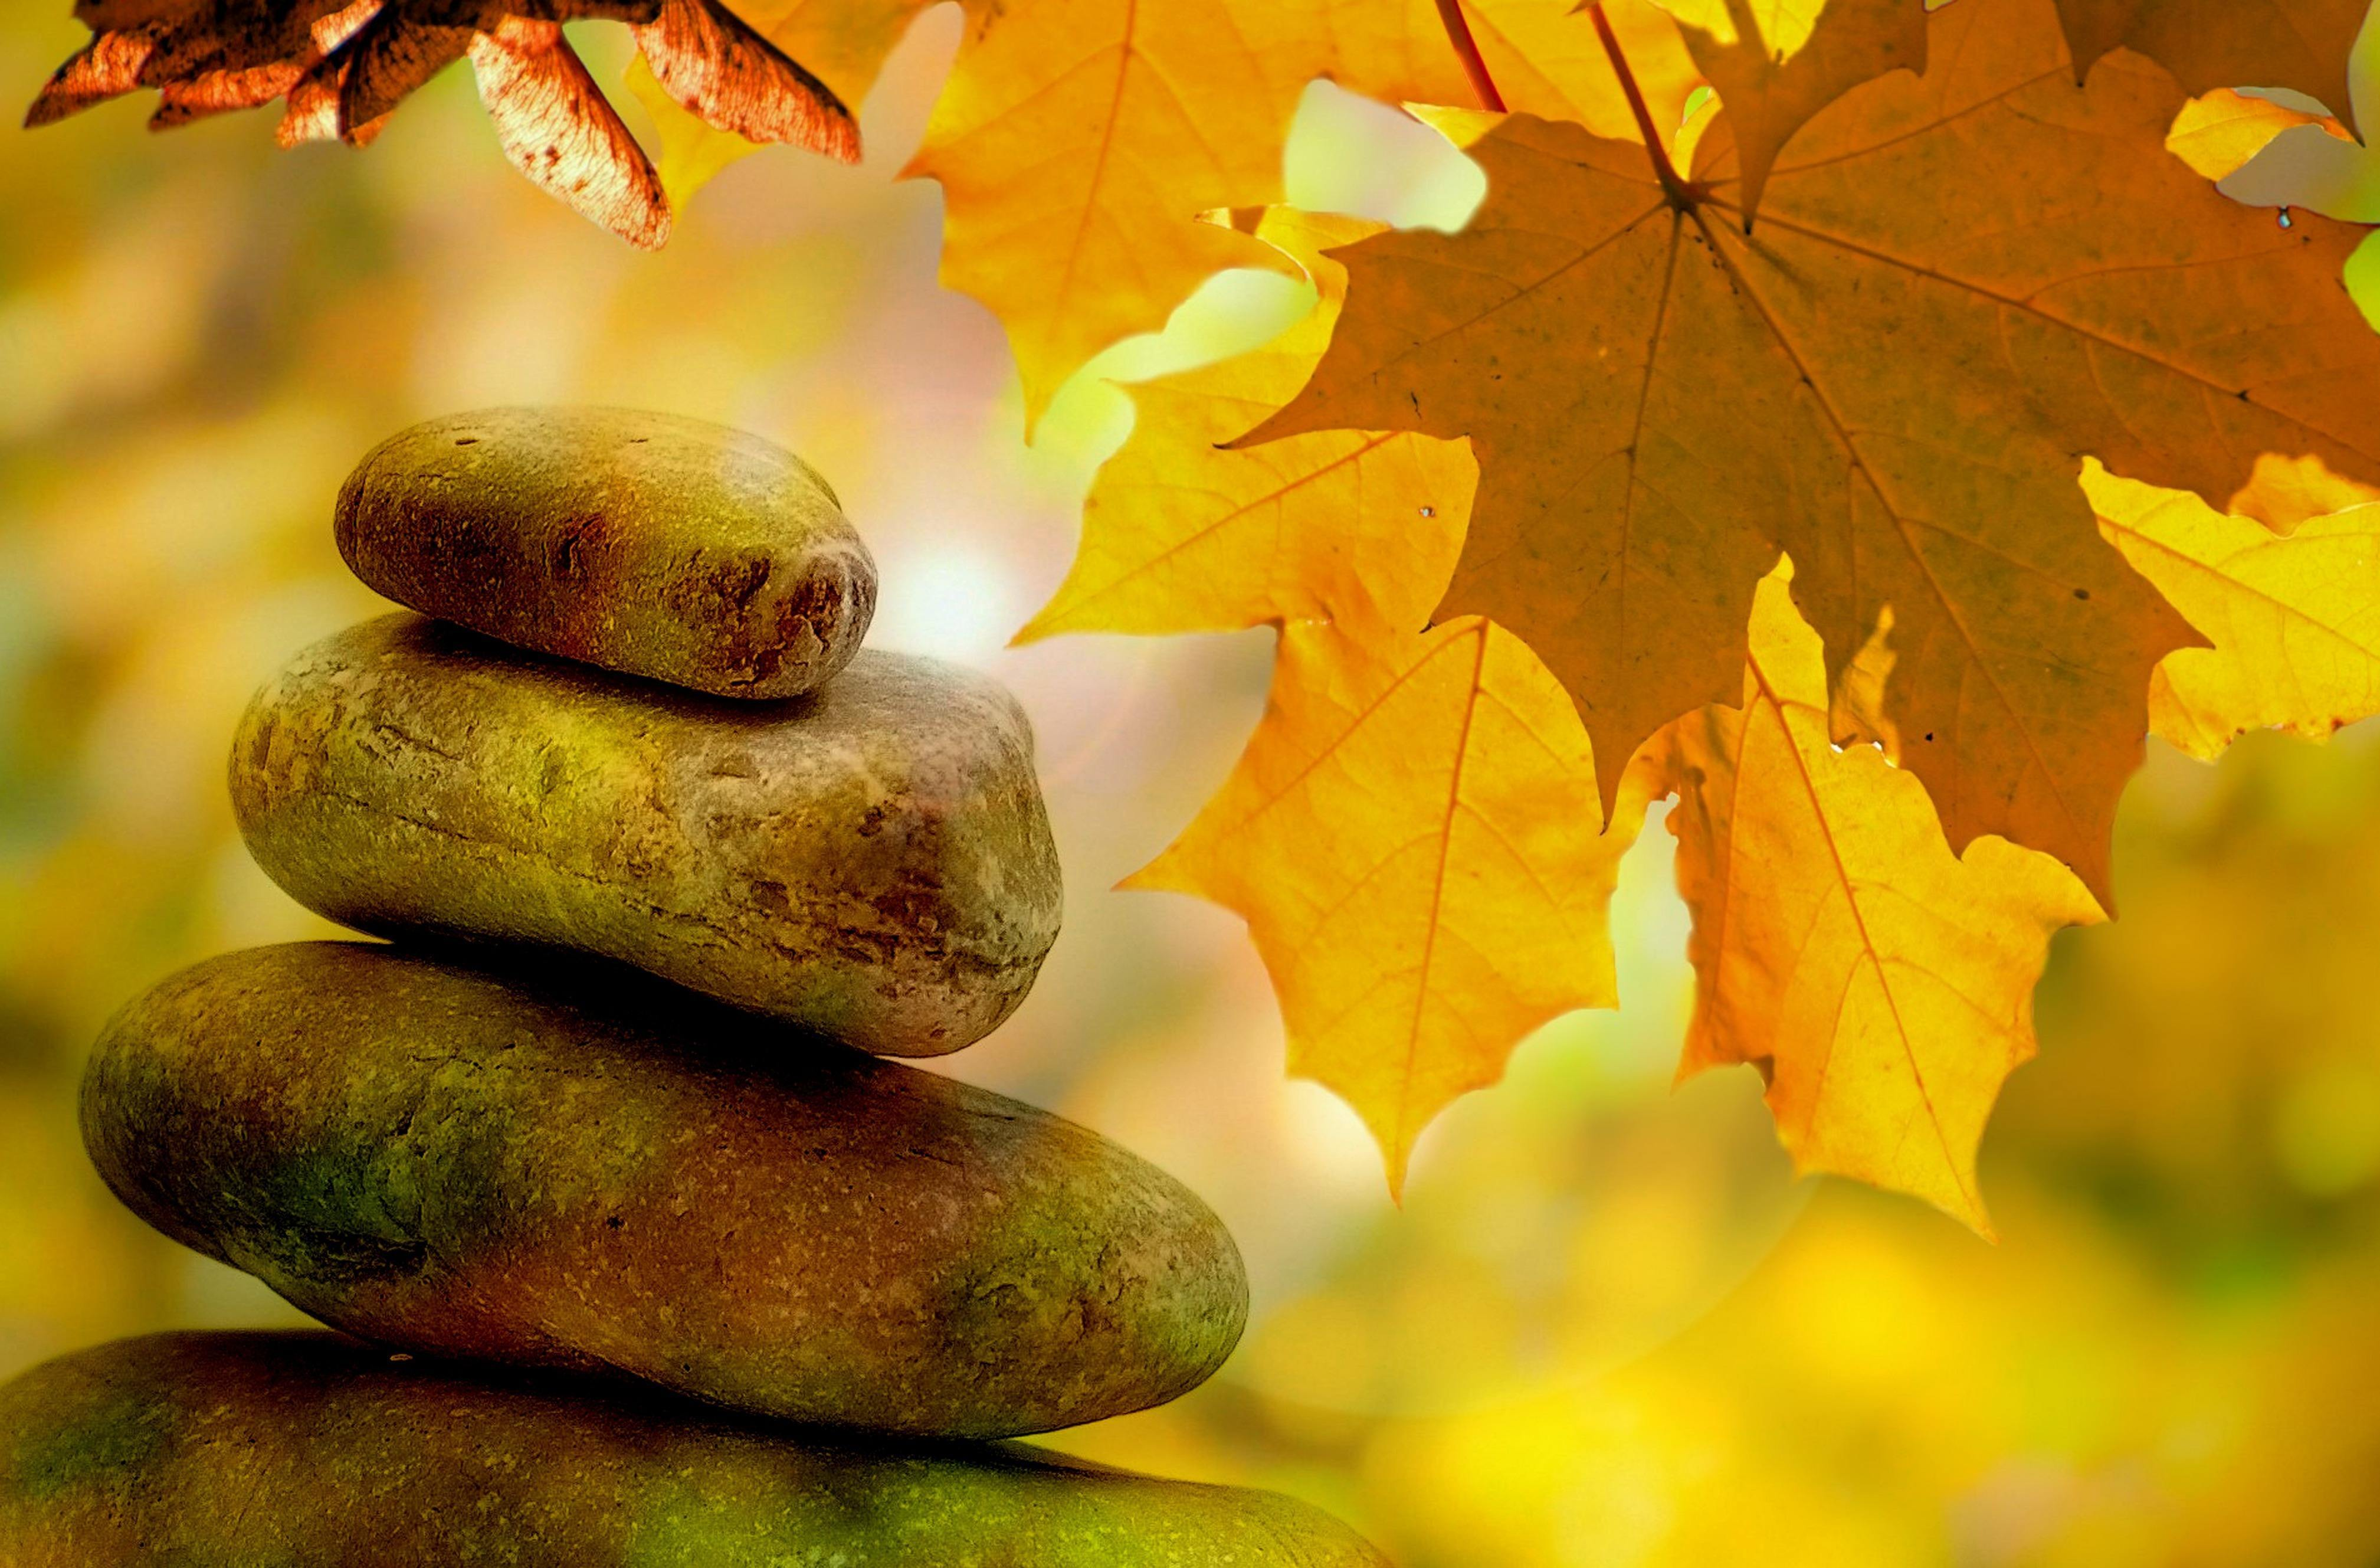 Autmn leaves and rocks